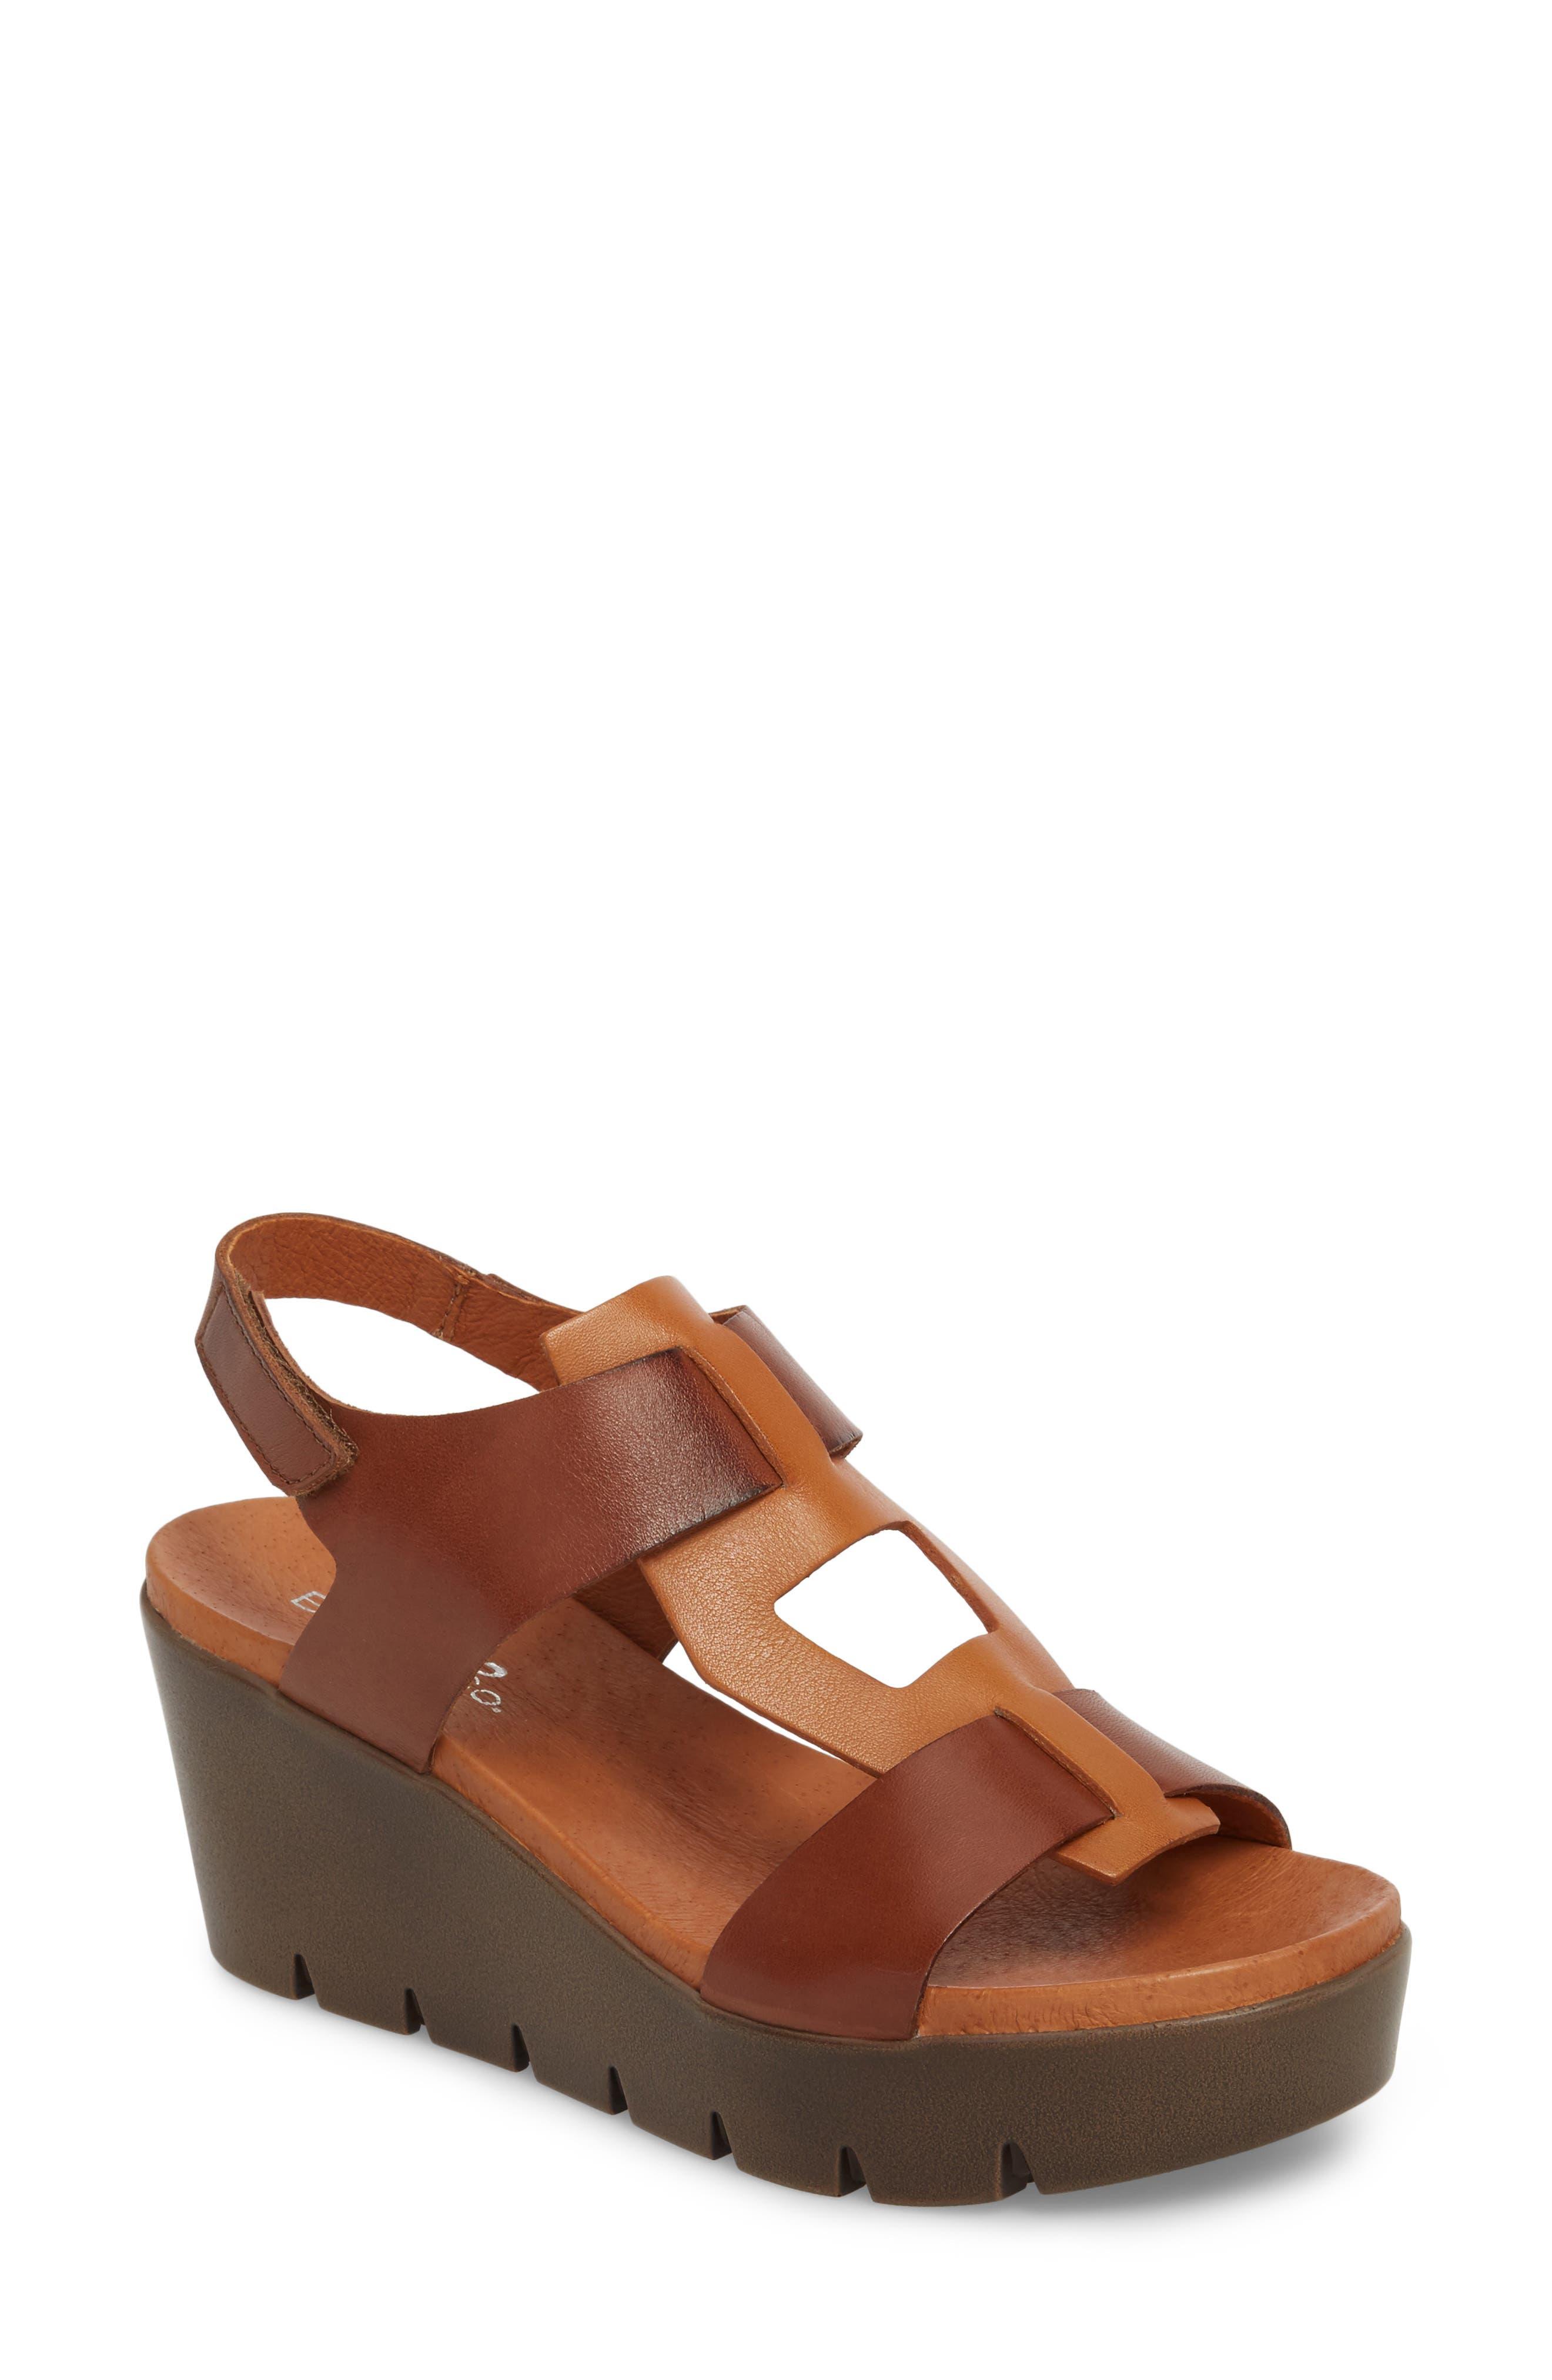 Bos. & Co. Somo Platform Wedge Sandal, Brown